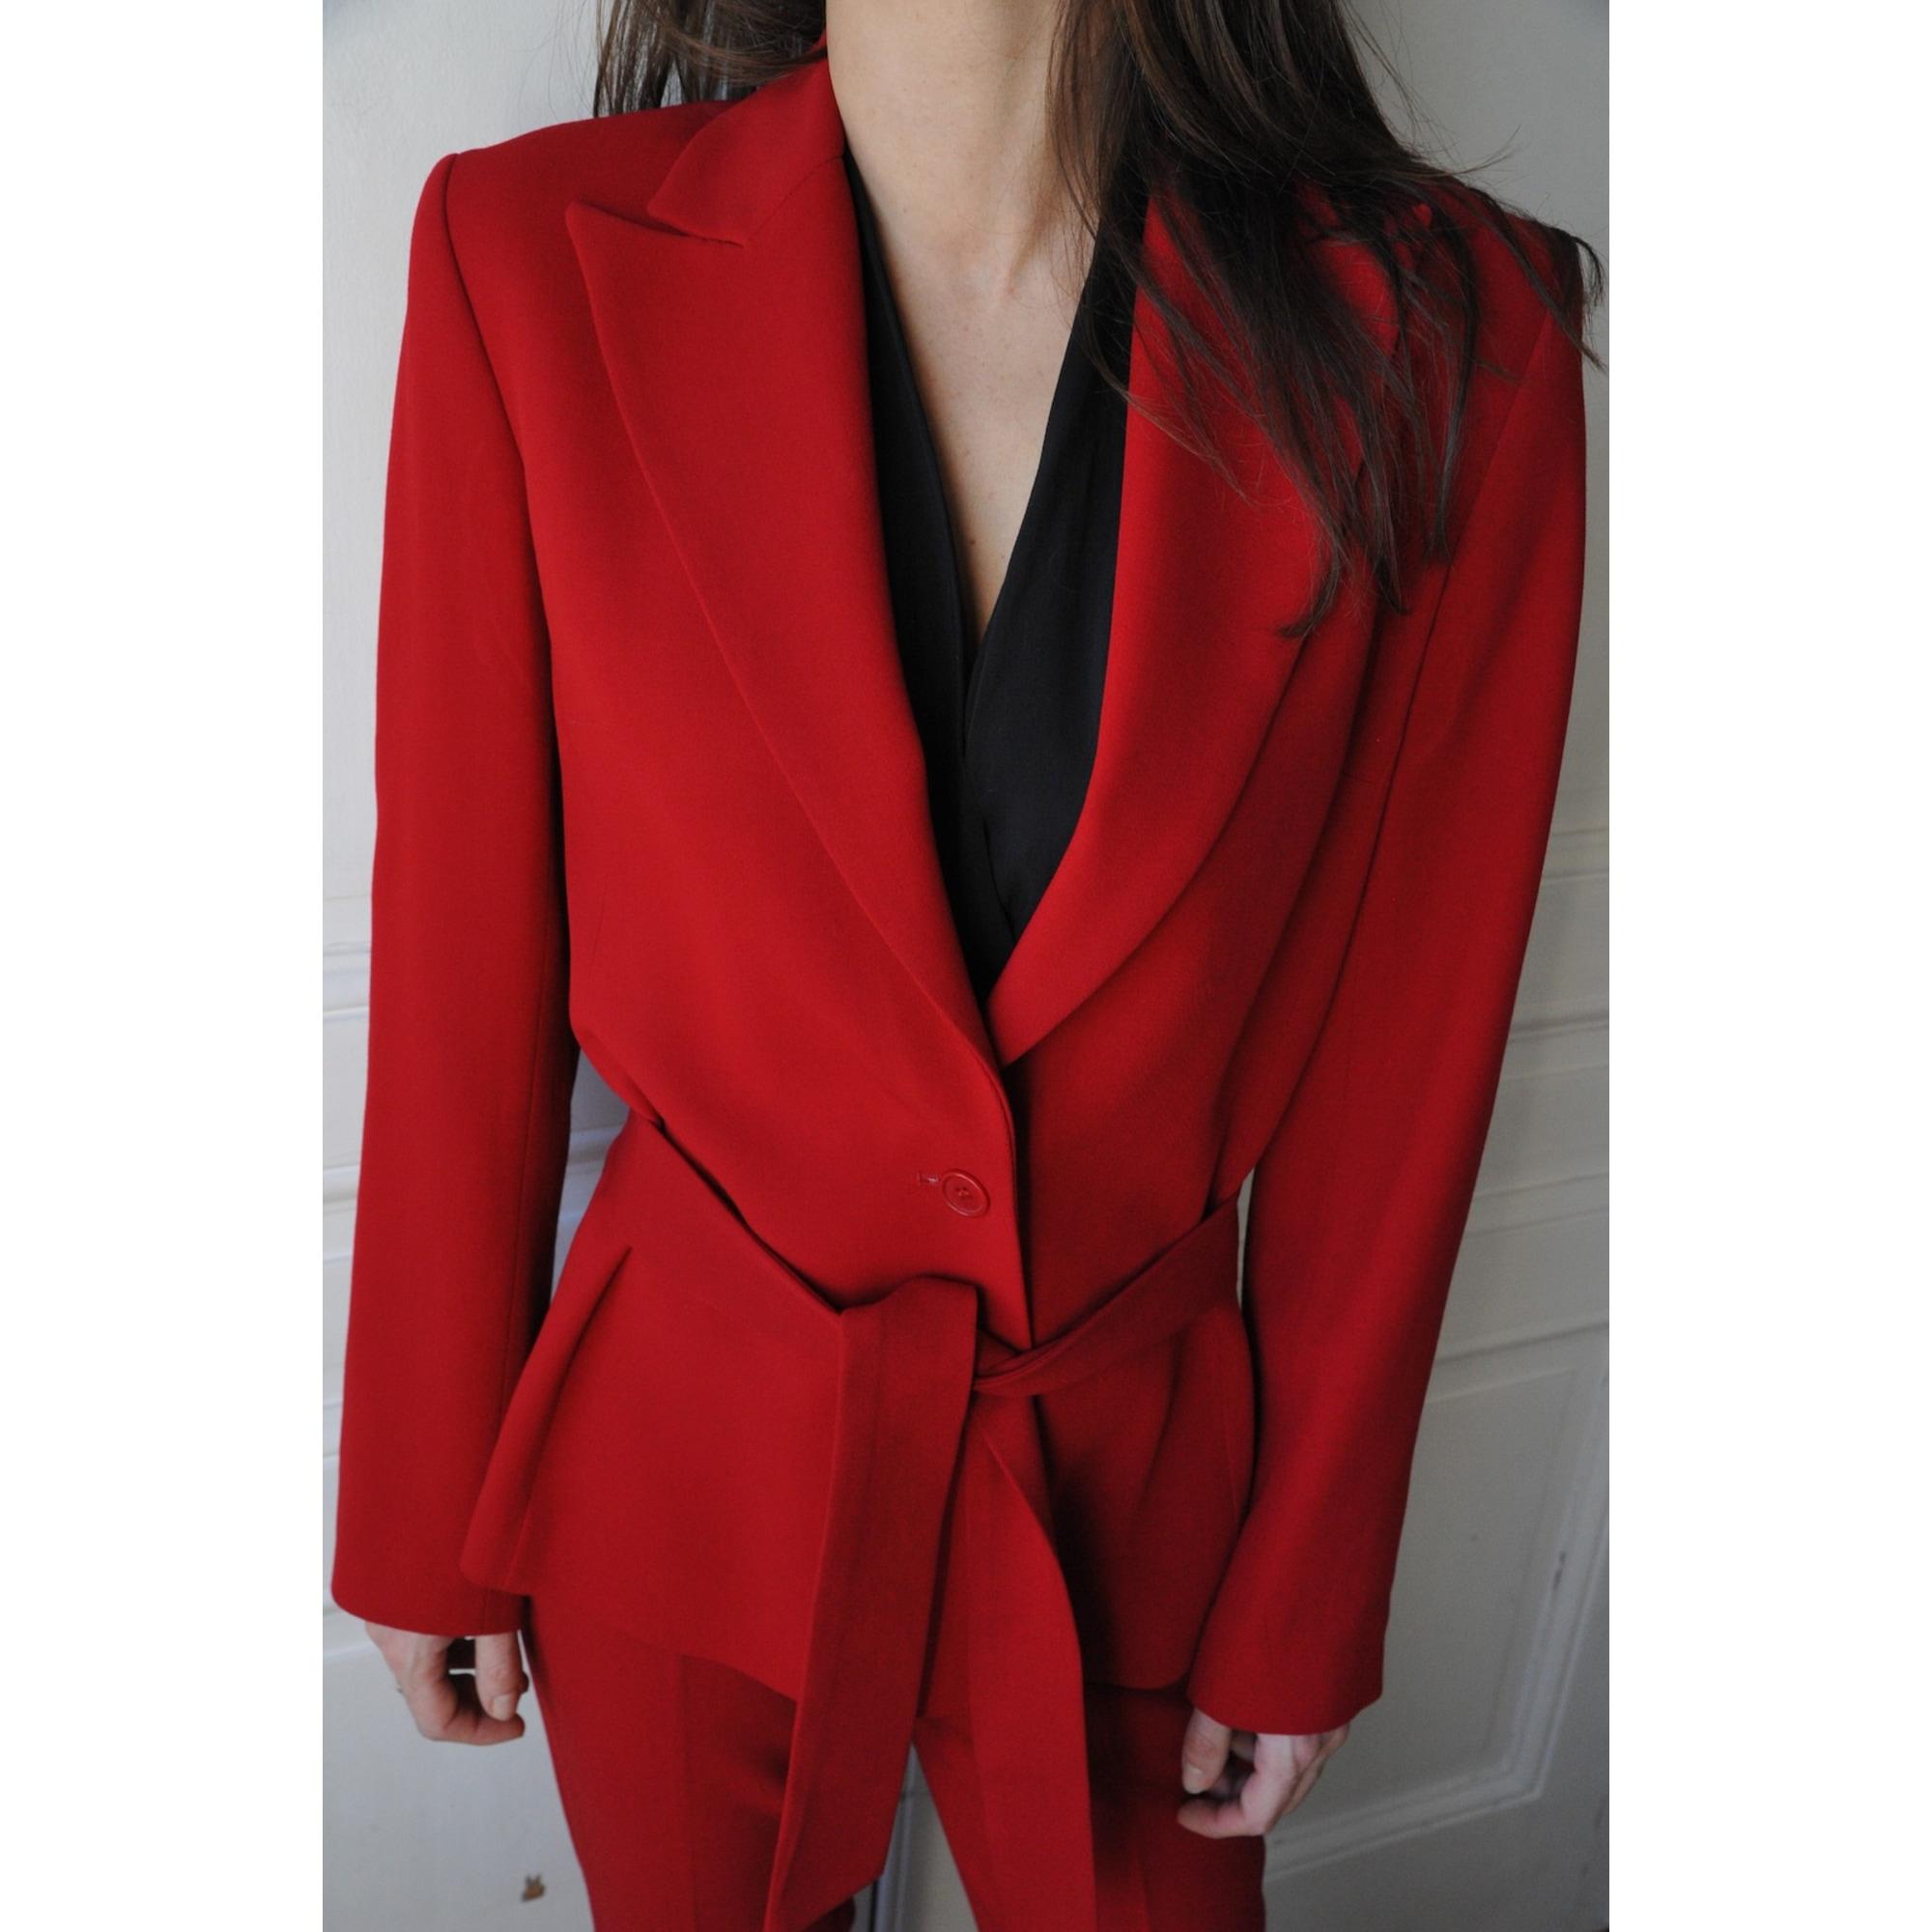 Pantalon Rouge Femme Zara Tailleur pqMGSUzV